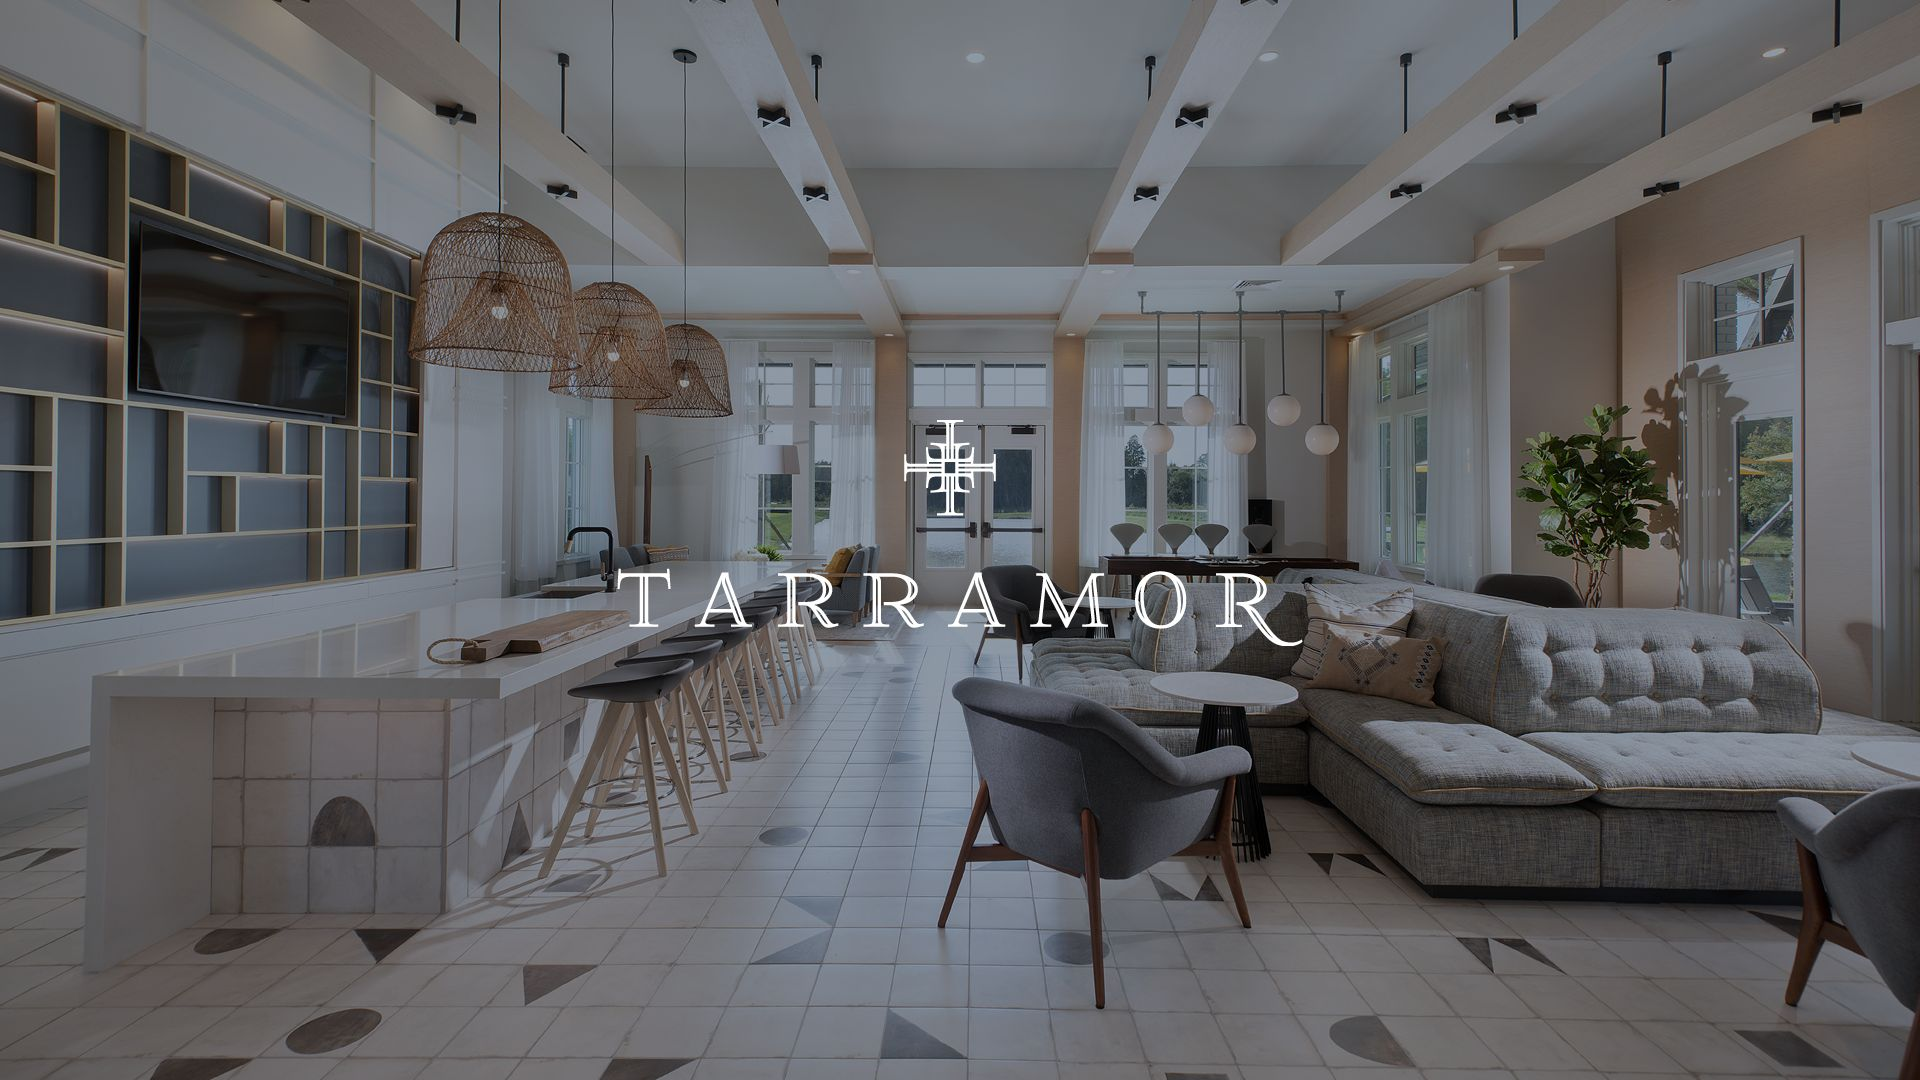 'Tarramor - Tarramor Premier' by Lennar - Central Florida in Tampa-St. Petersburg